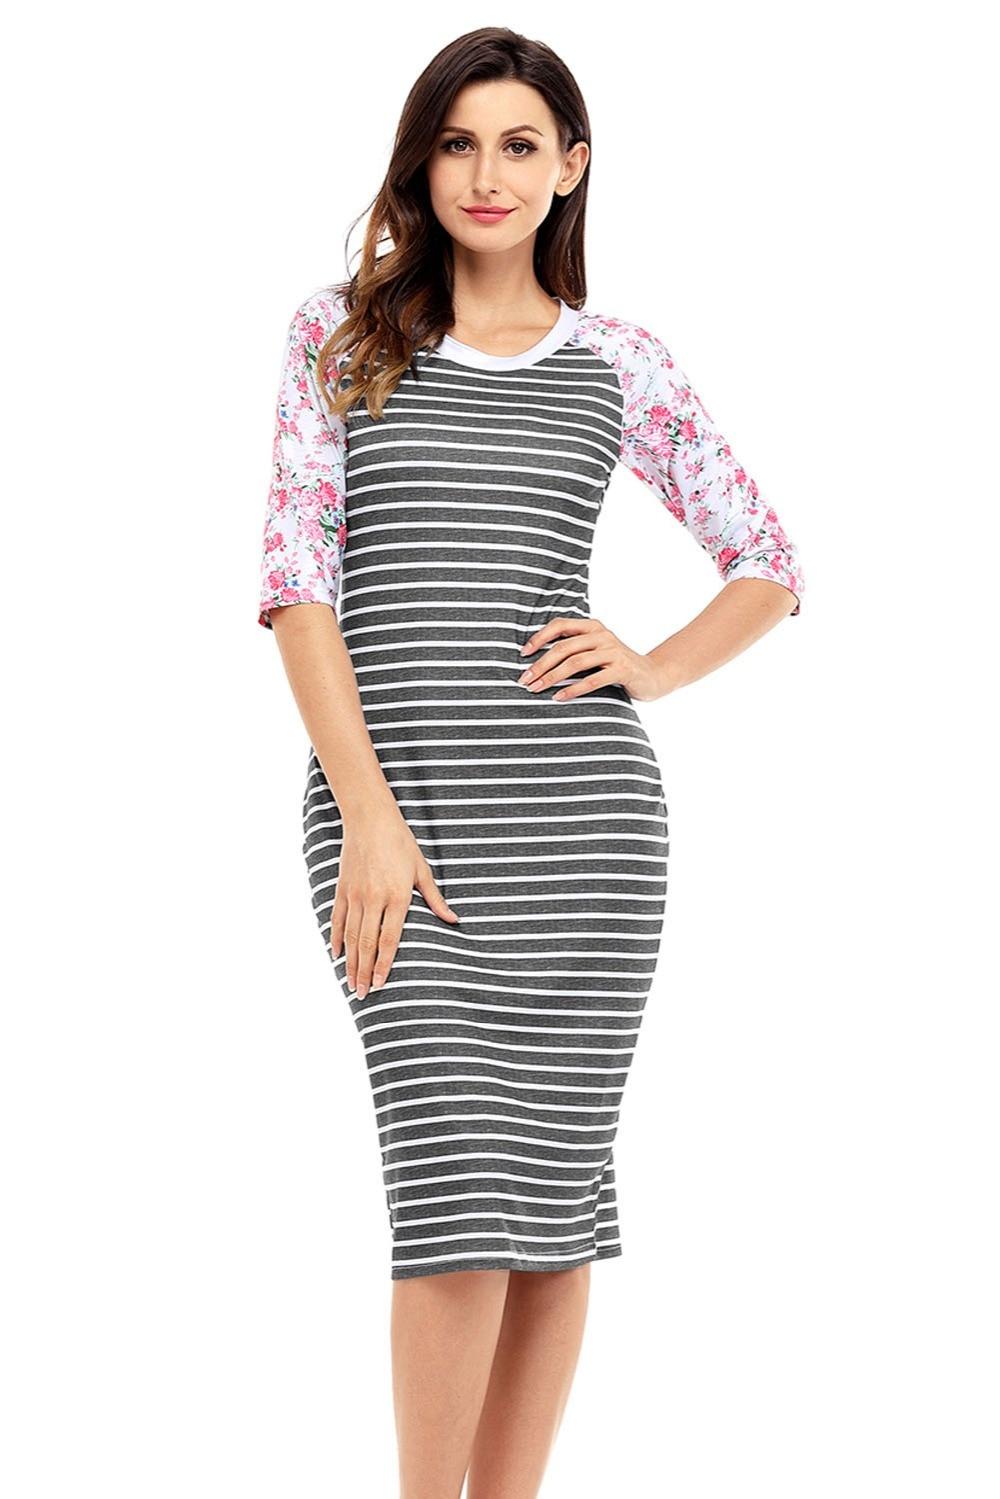 White shirt dress women stripes Half Sleeves Hobo Midi ...